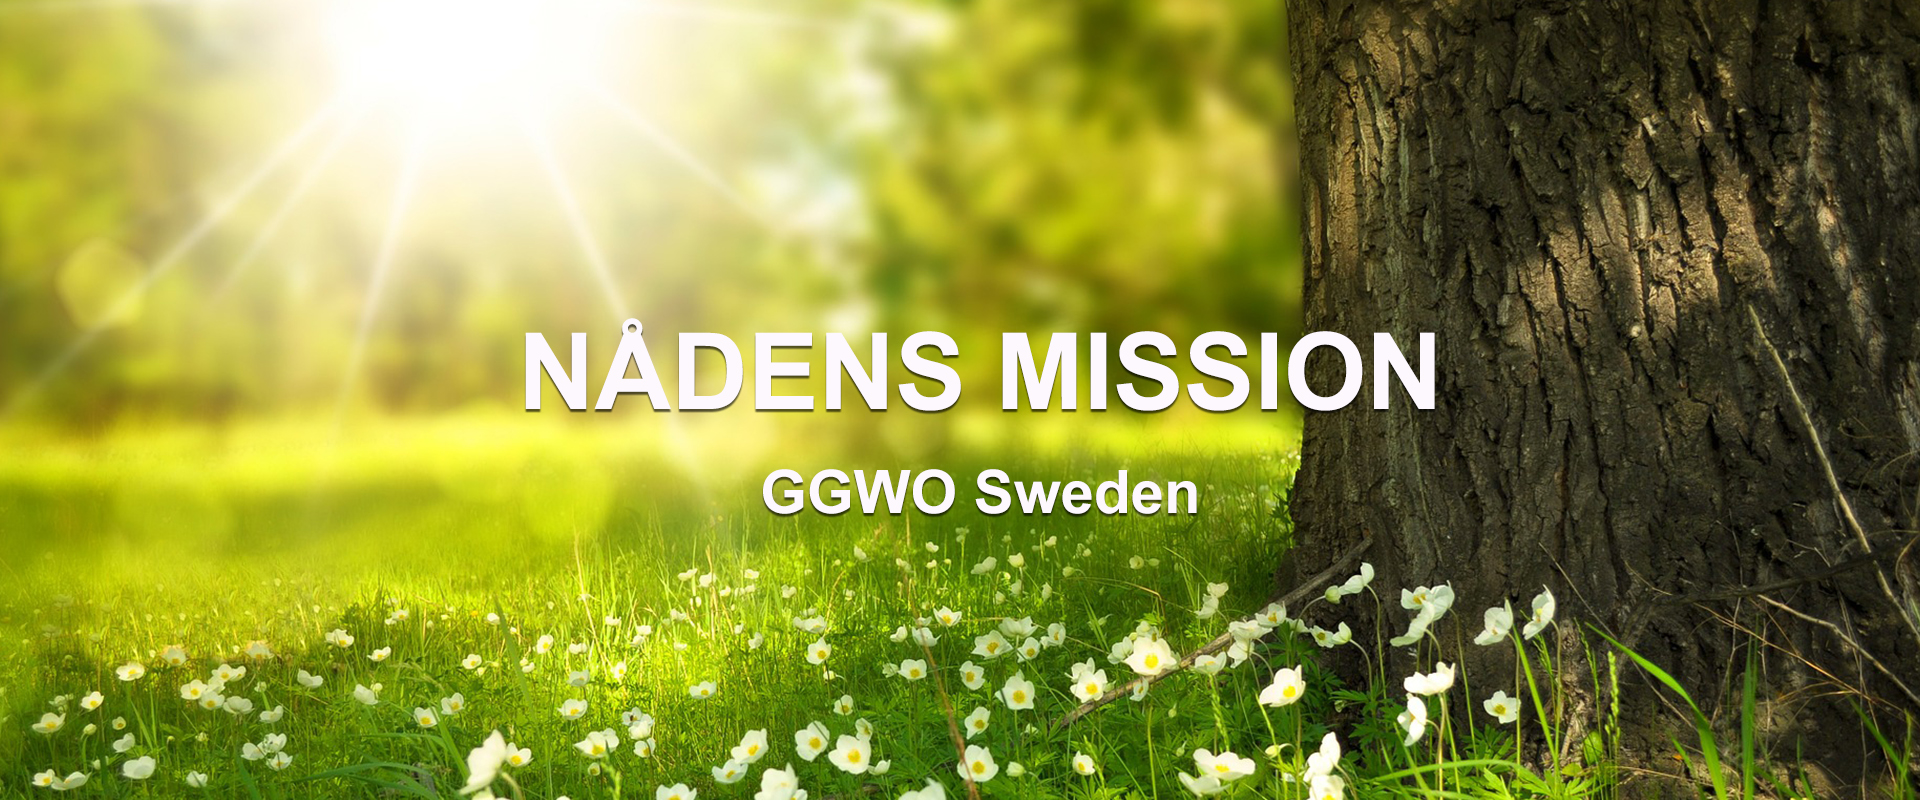 Bildtext: Nådens Mission, ggwo Sweden